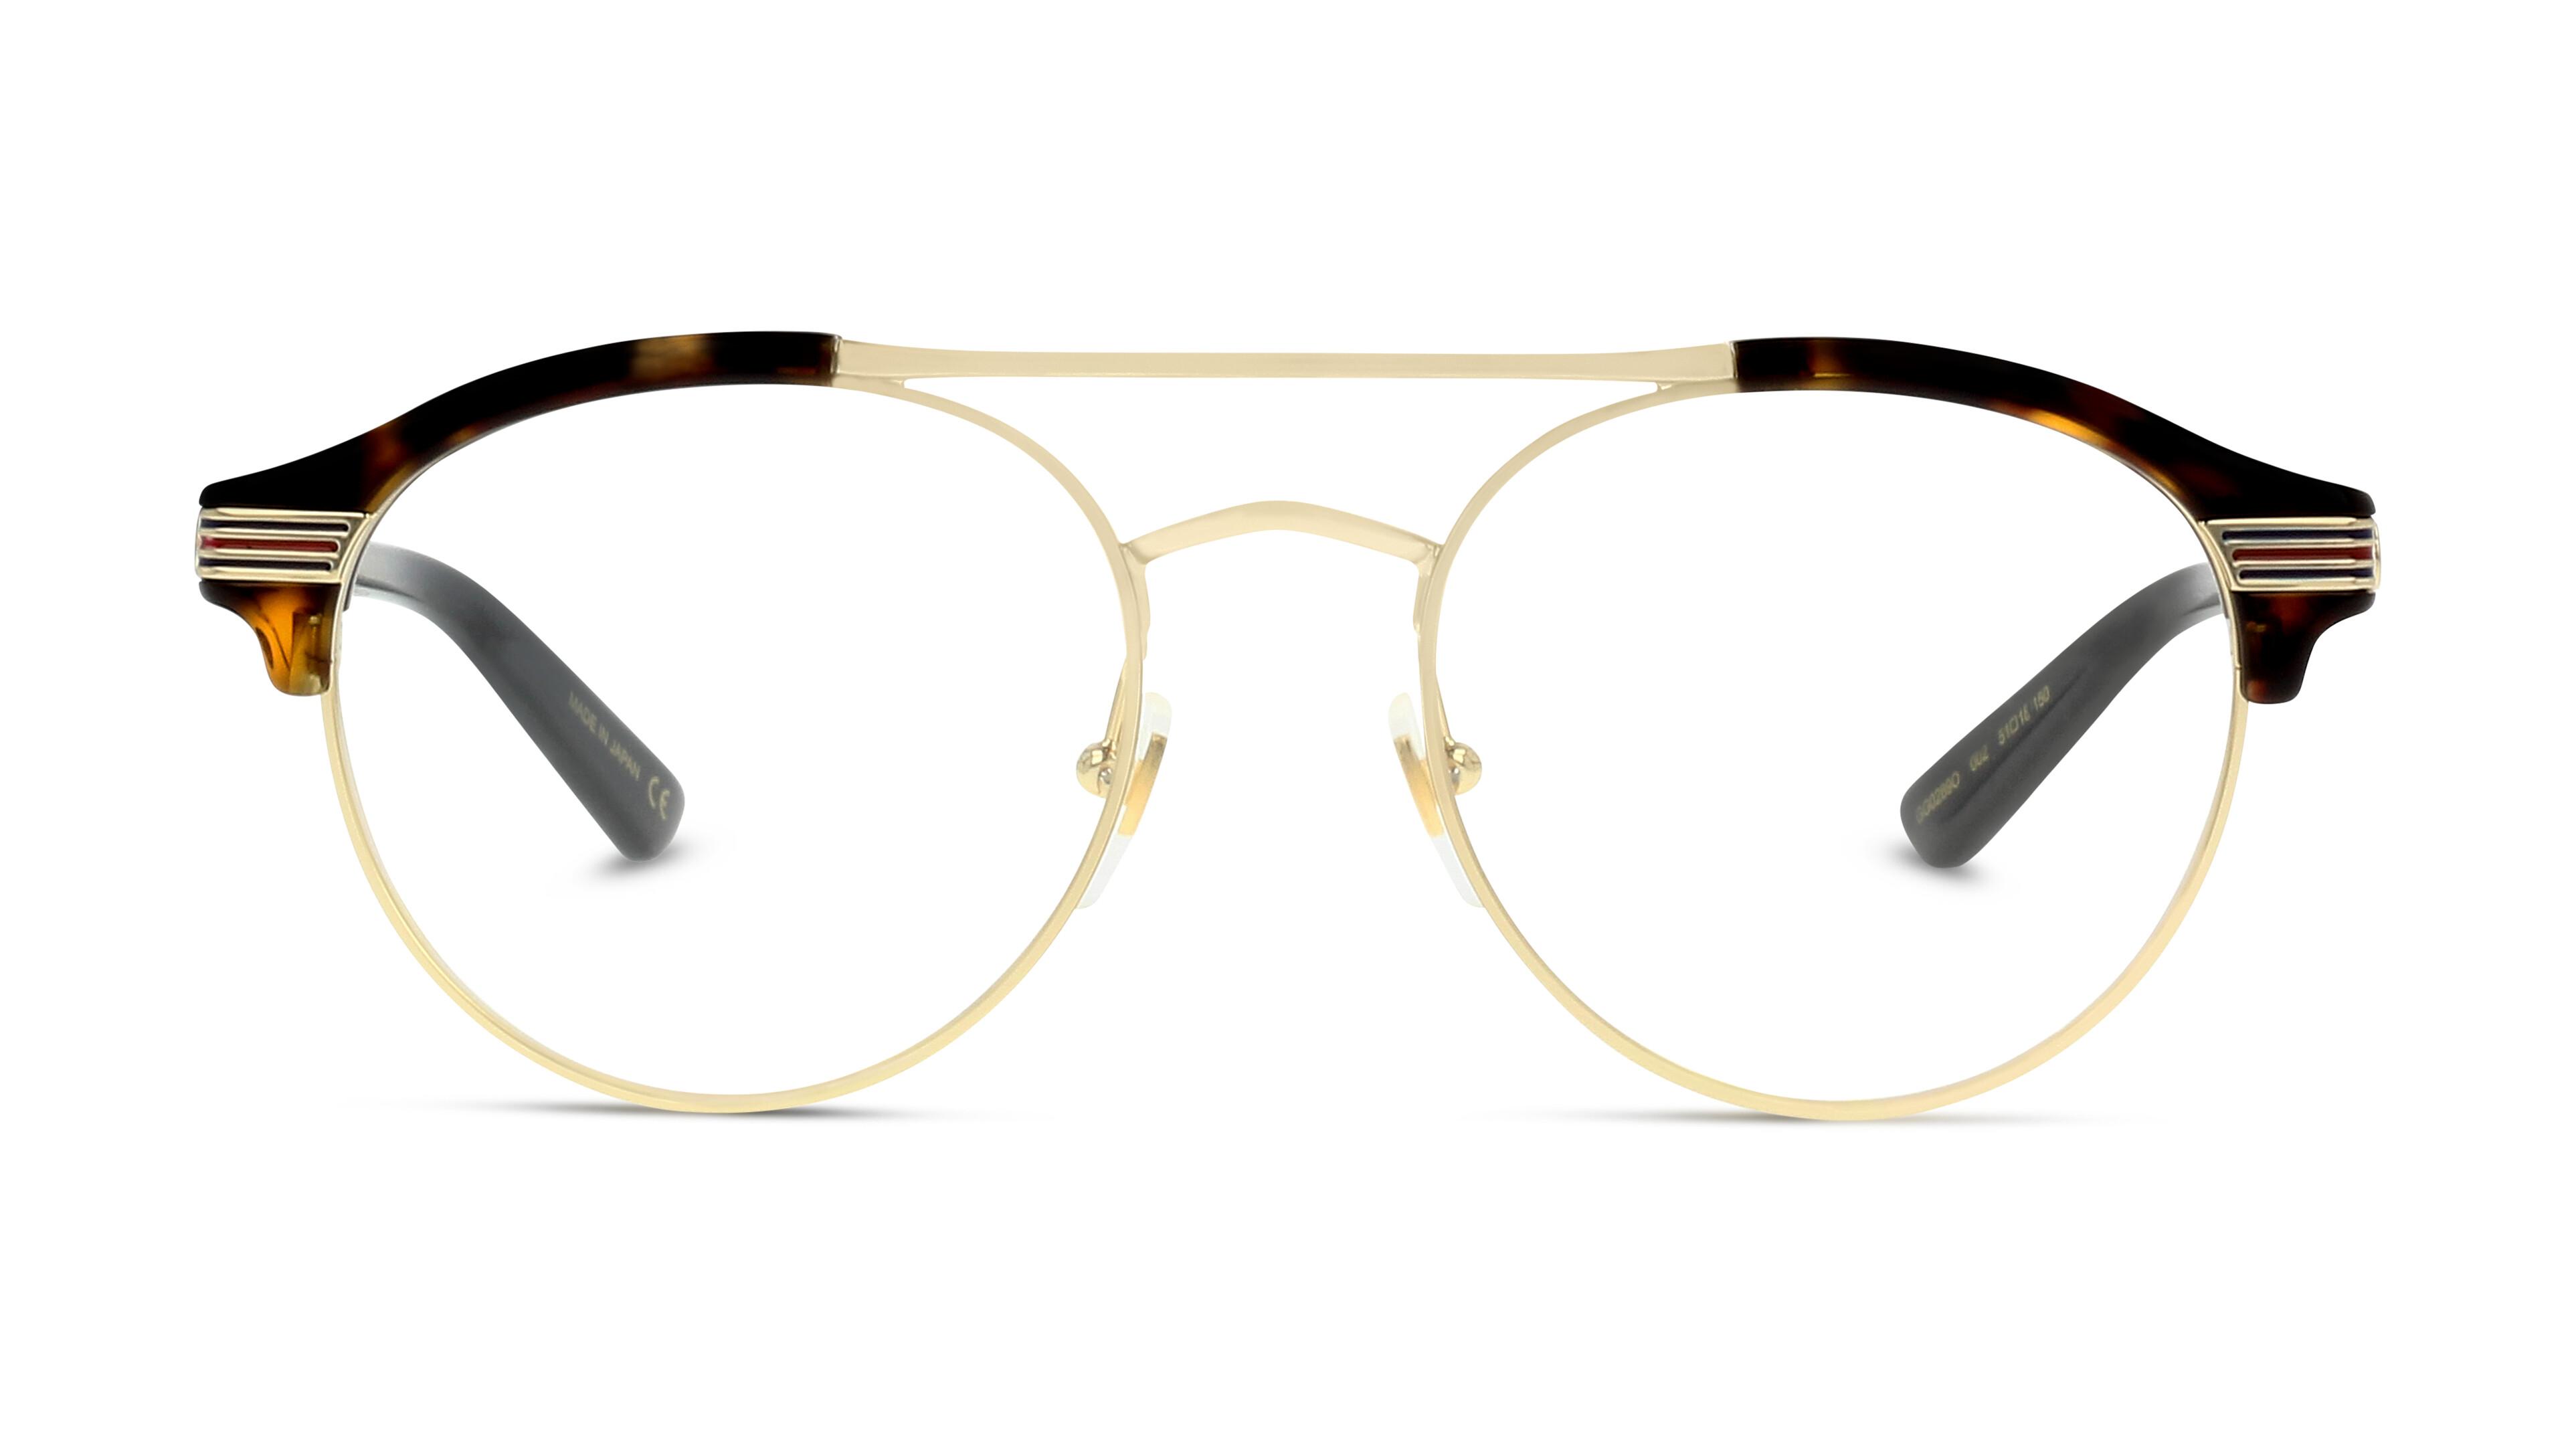 8056376156249-front-brillenfassung-gucci-gg0289o-havana-gold-transparent